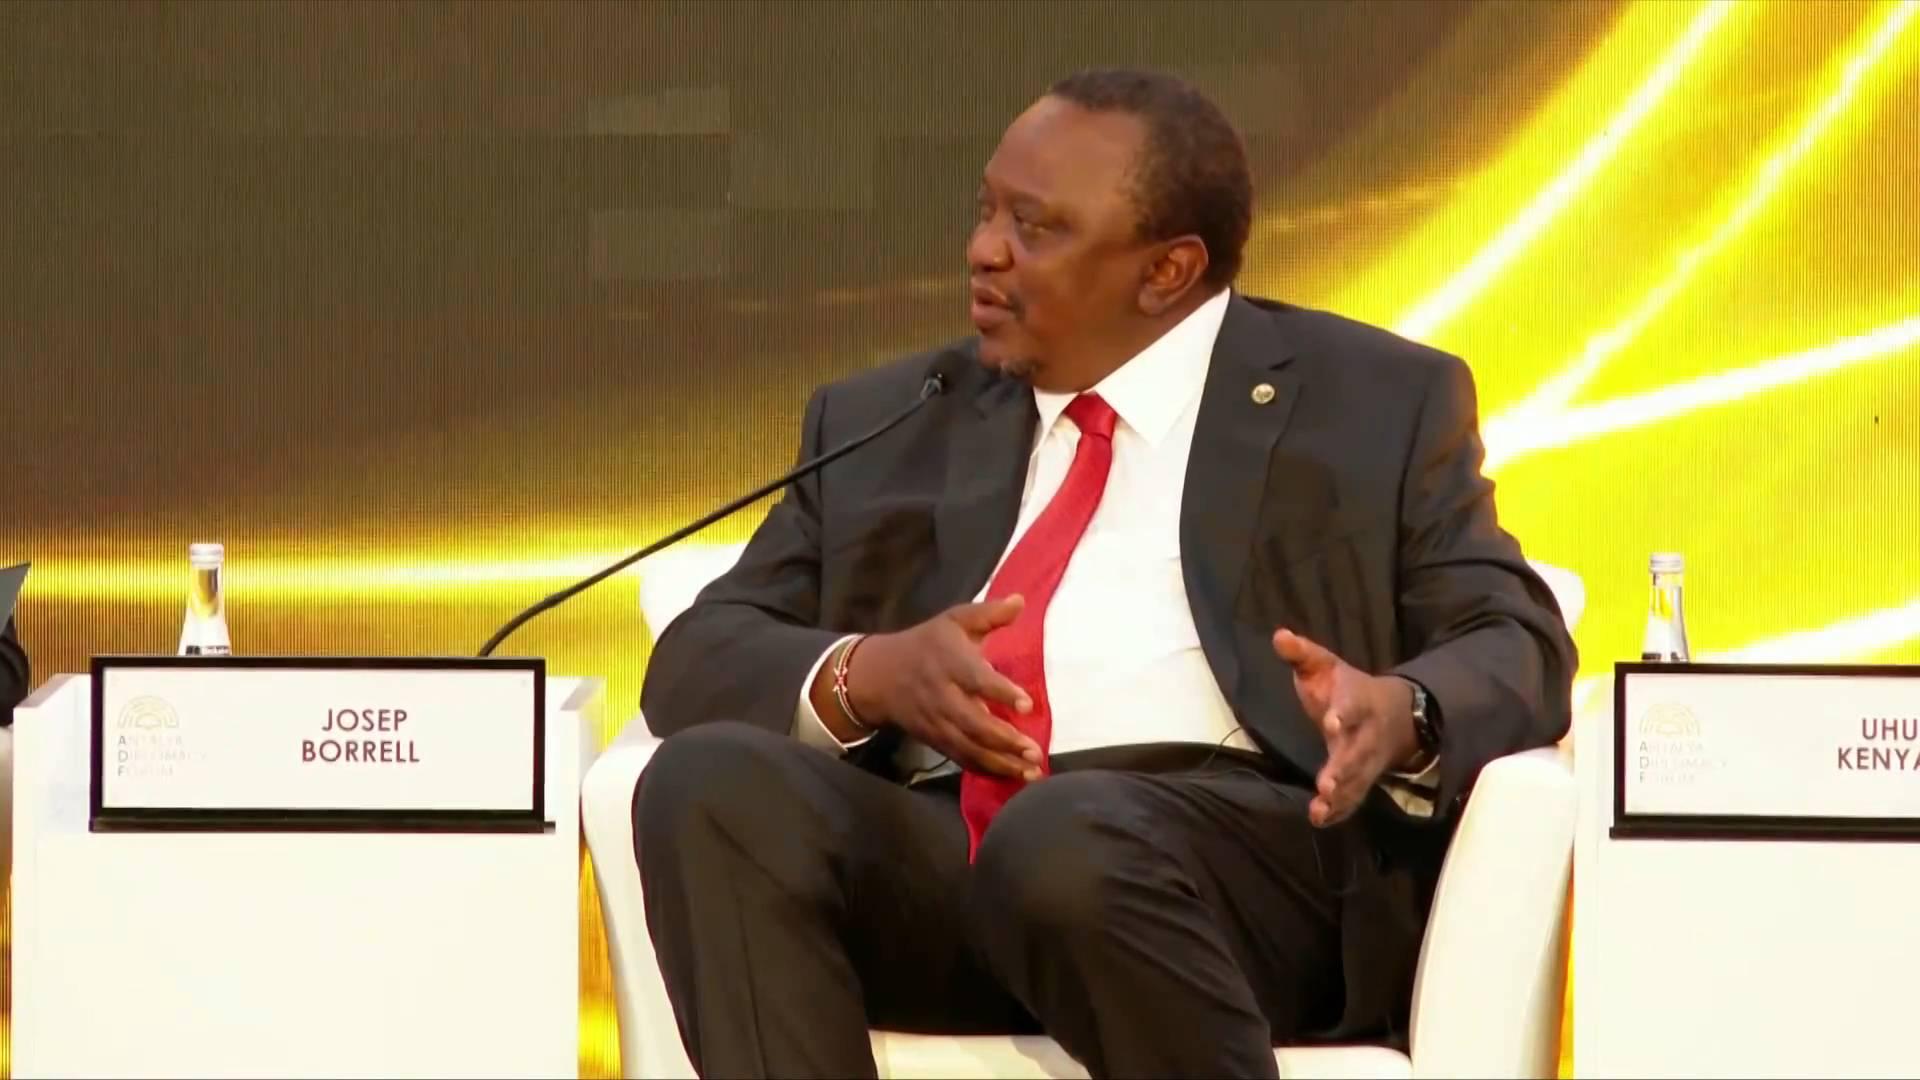 GLOBALink | Kenyan president says vaccine nationalism stalling COVID-19 fight